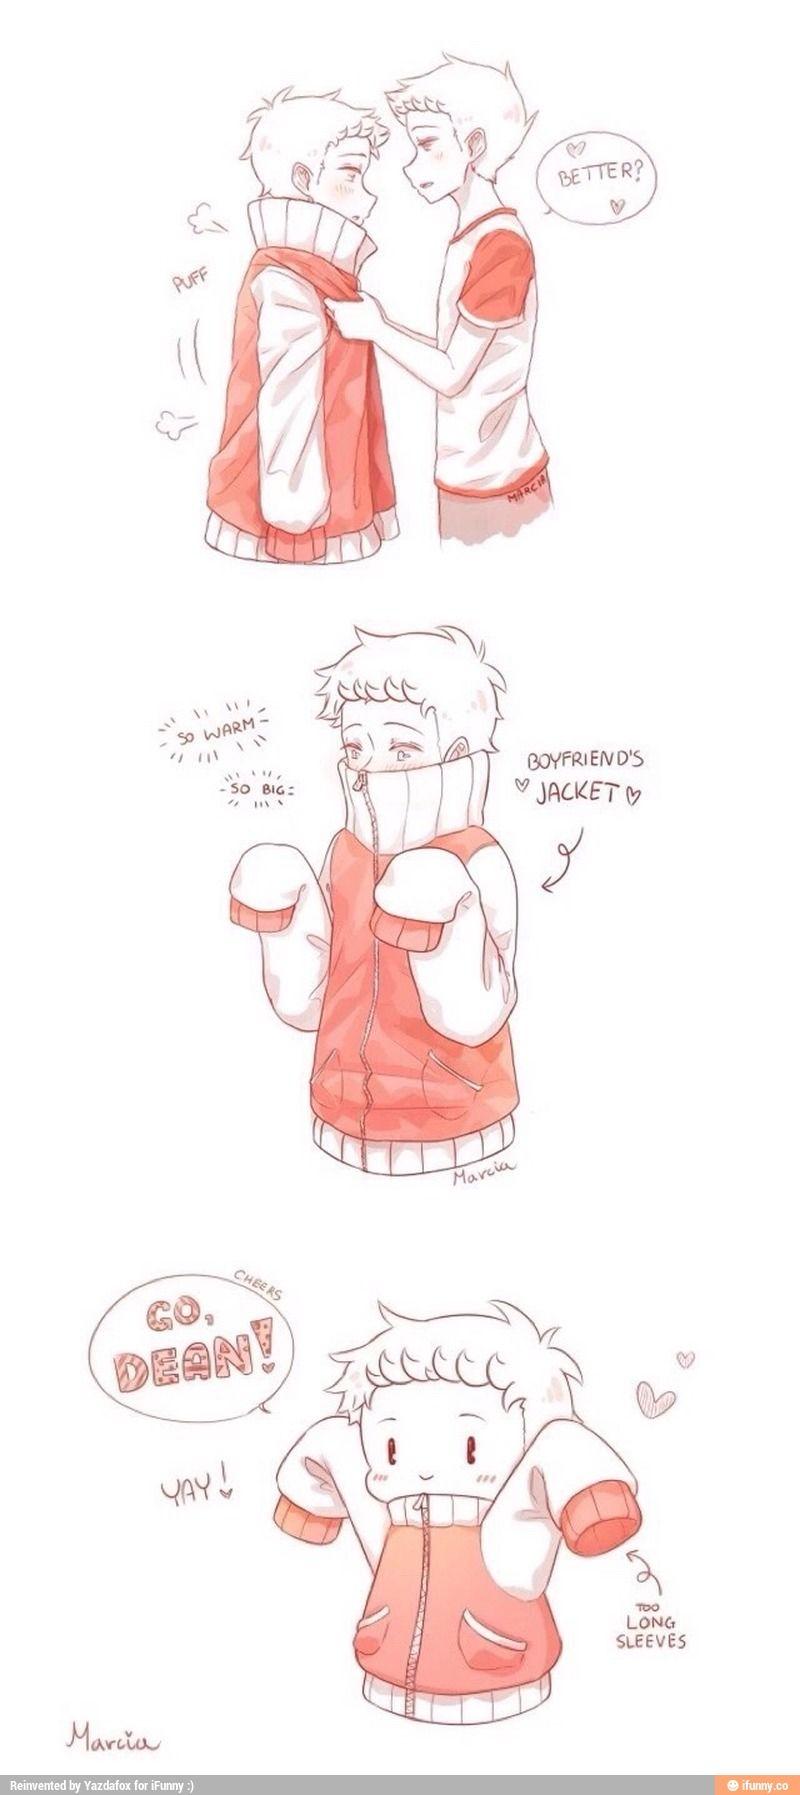 cradit, marcia, destiel, cute BOYFRIEND JACKET!!